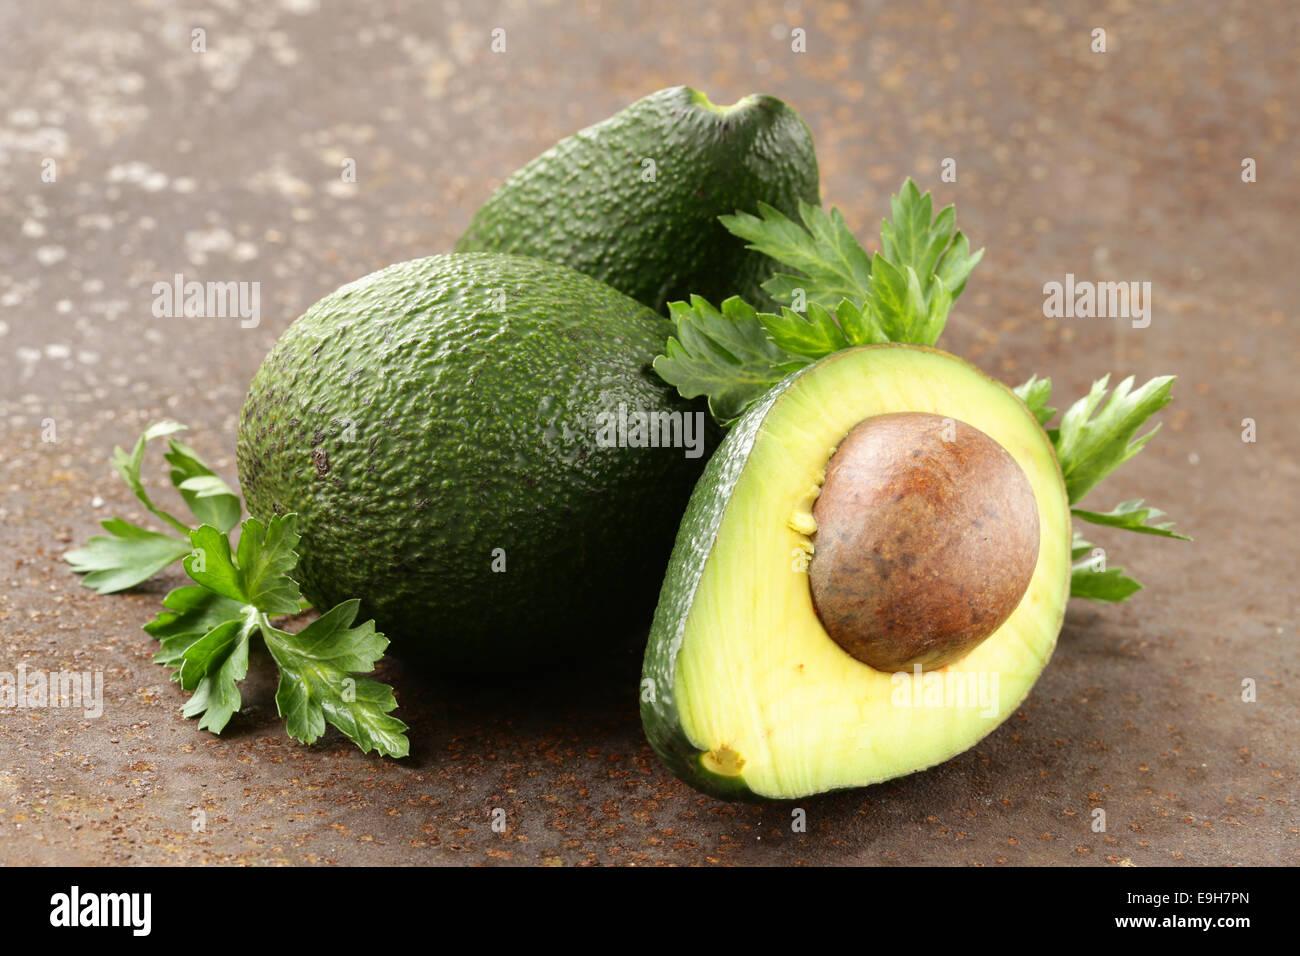 fresh organic ripe avocado with leaves of parsley - Stock Image